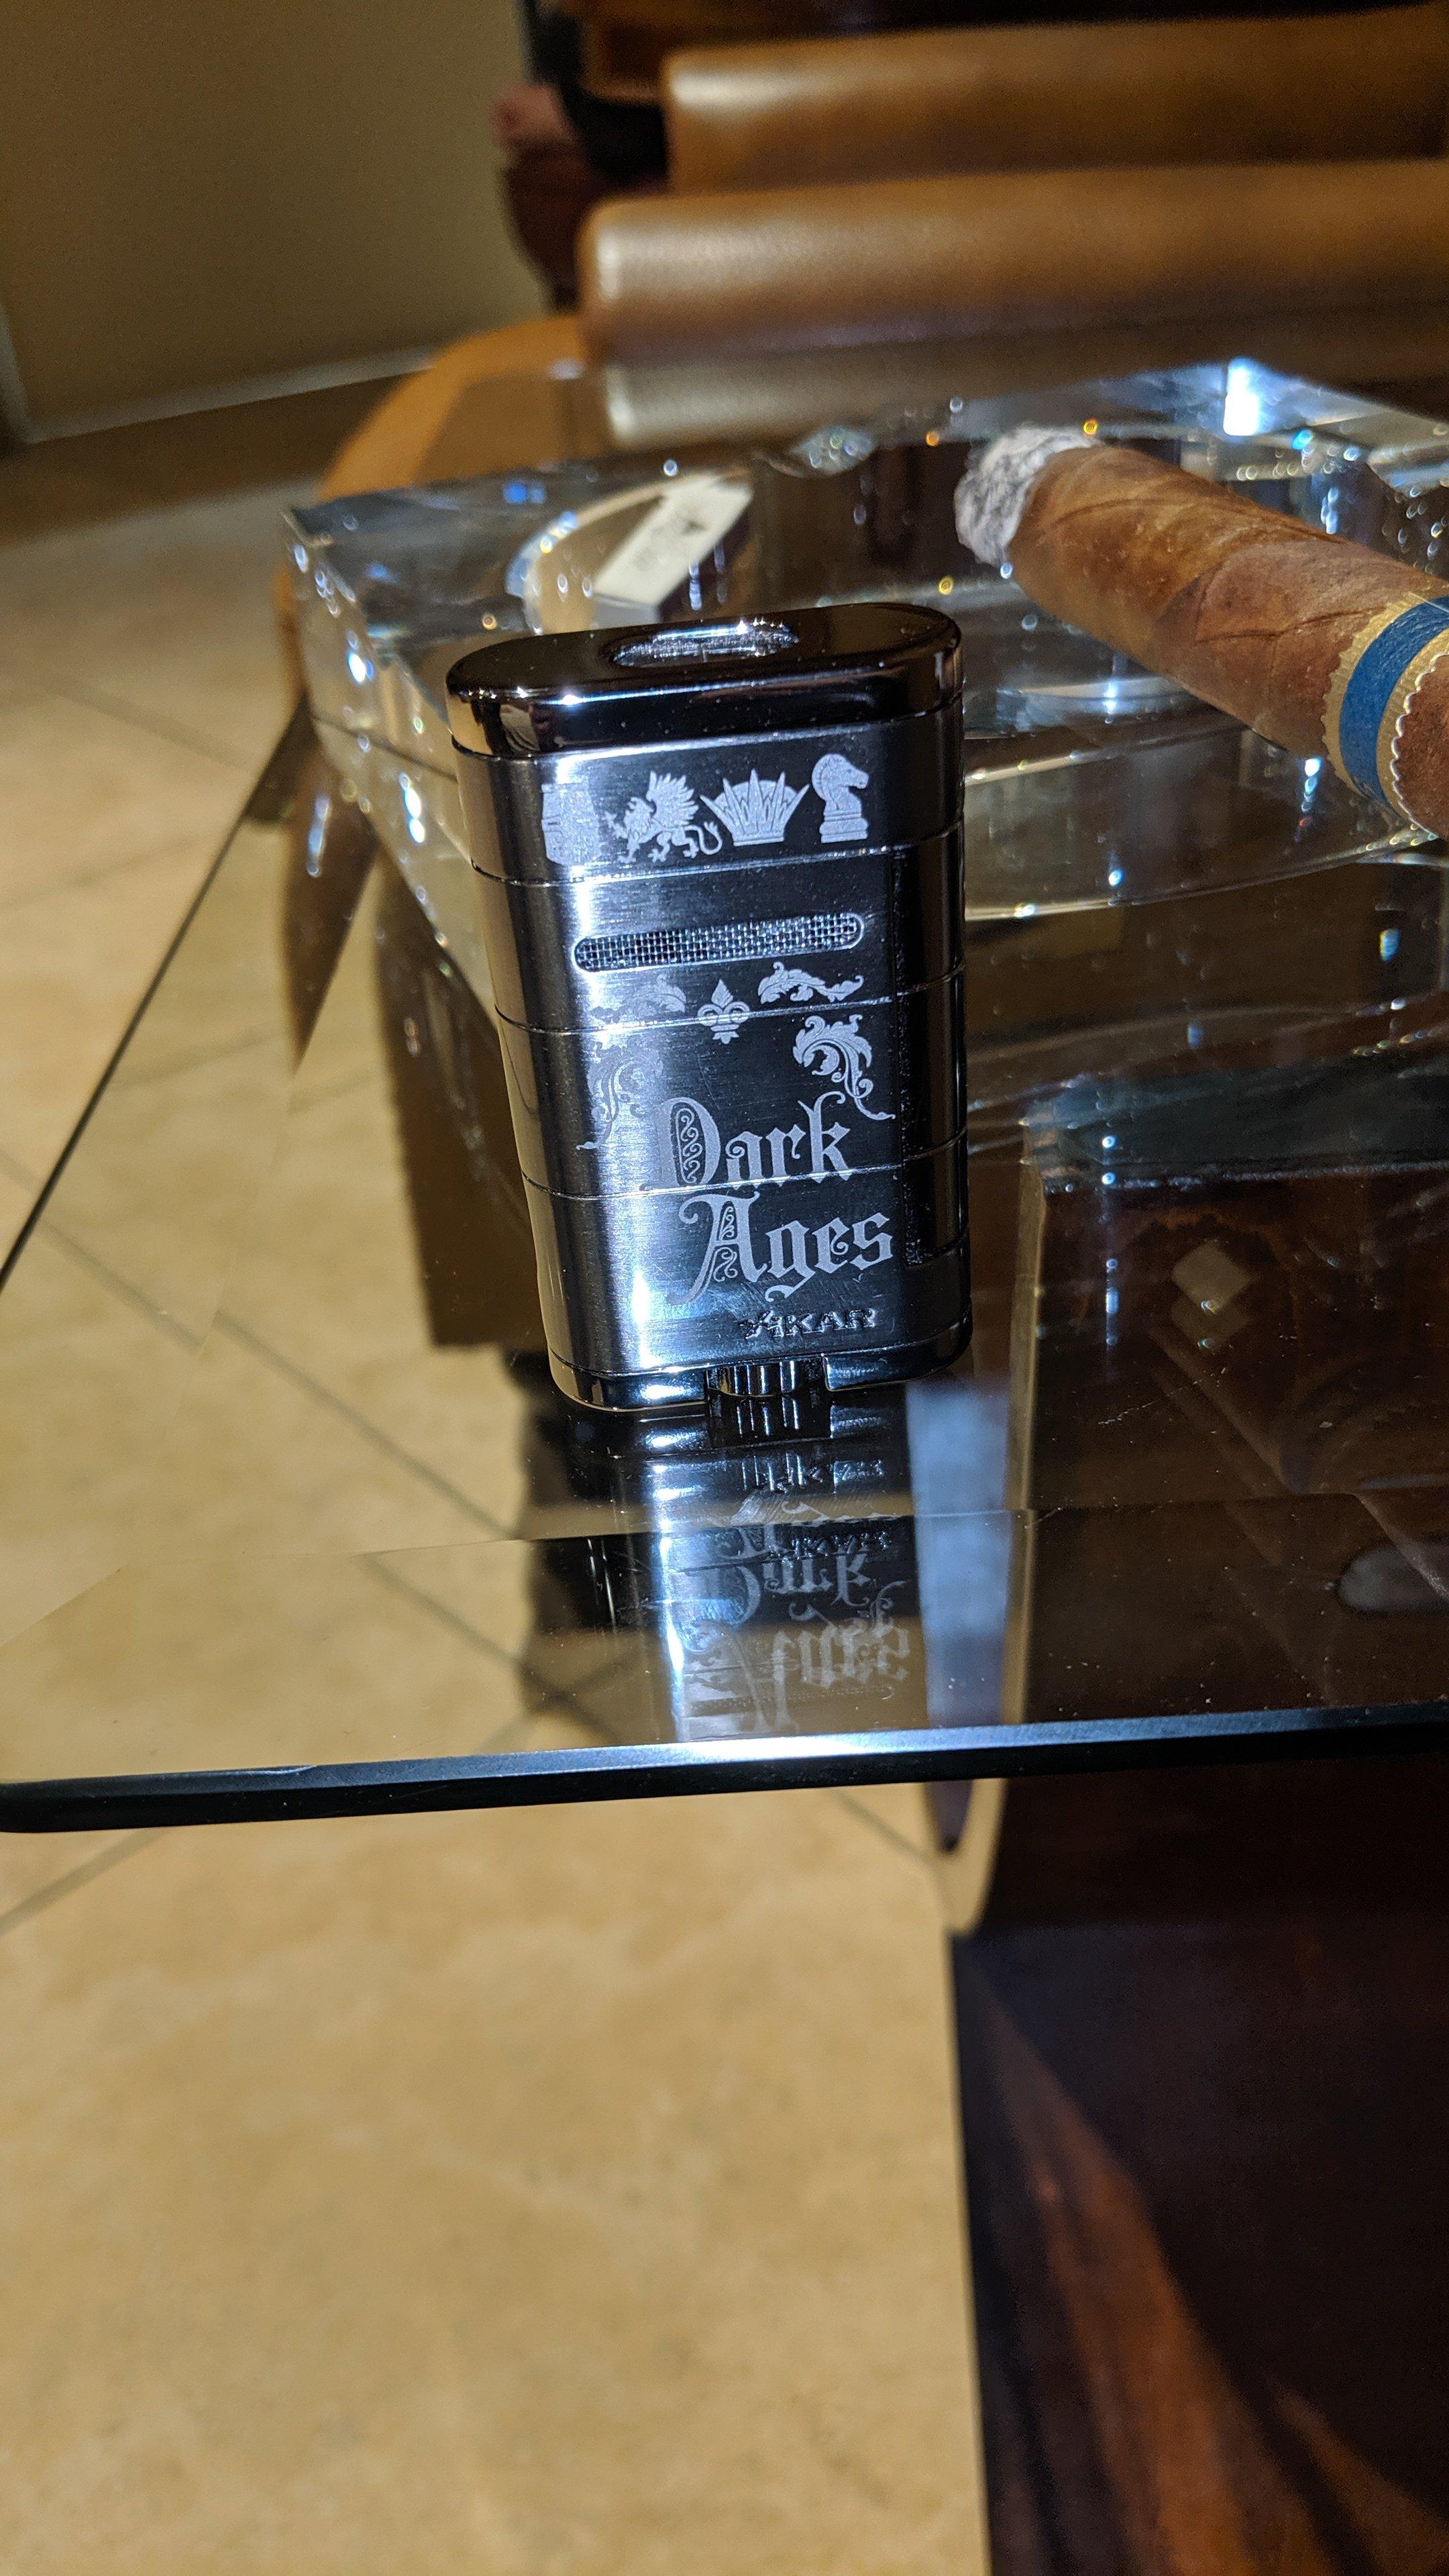 Astounding Favorite Accessories Lighters Ashtrays And Stuff Cigar Interior Design Ideas Helimdqseriescom